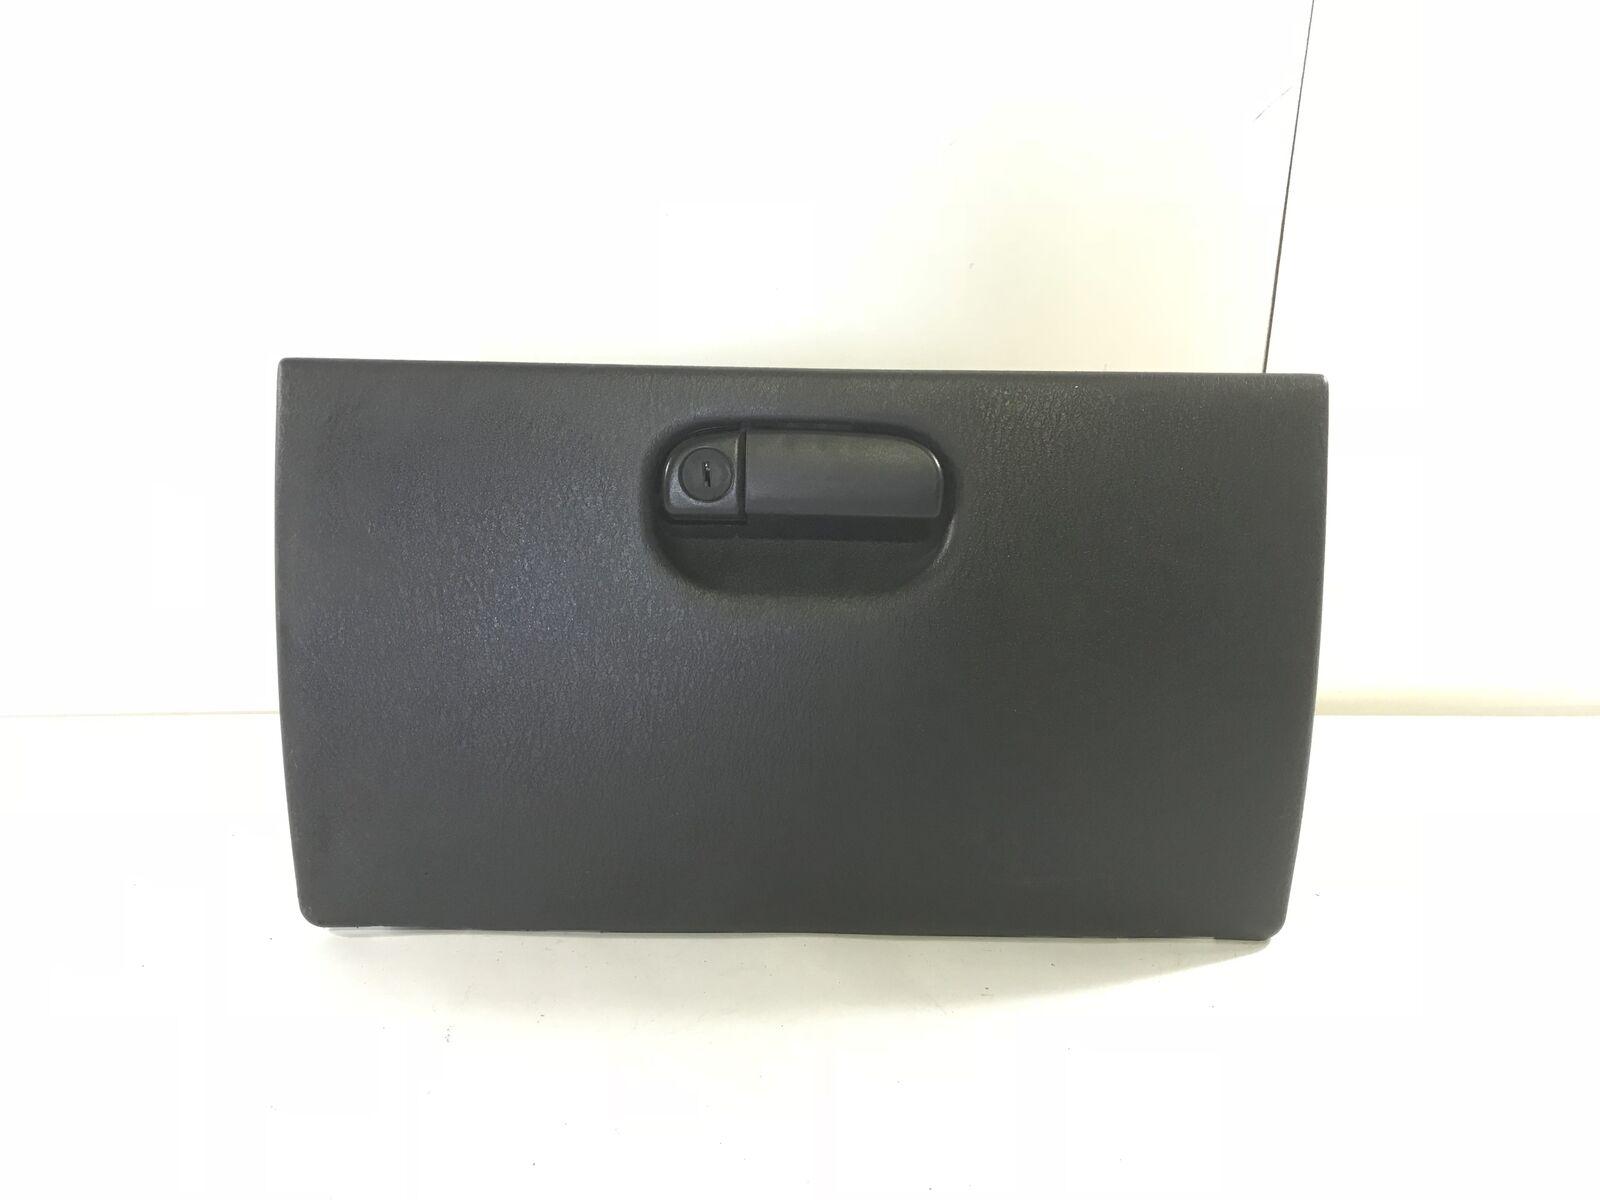 5DP56LAZAC Glovebox with Latch Assembly Agate Black Mopar OEM